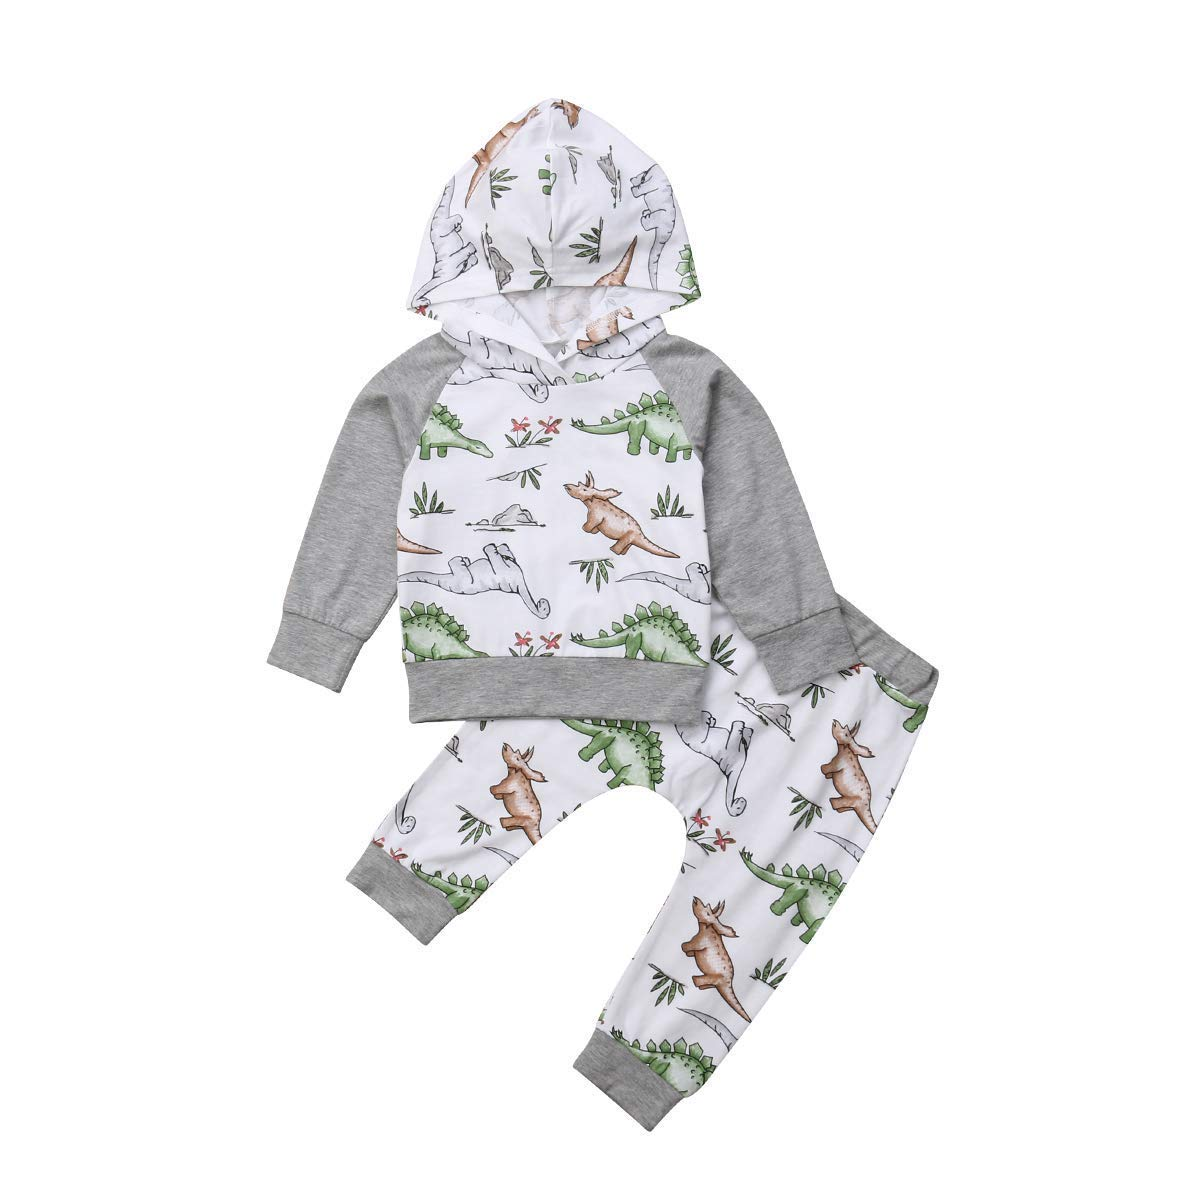 Toddler Infant Baby Boys Clothings Set,Dinosaur Printed Long Sleeve Hoodie Tops Sweatsuit Pants Outfit Sets